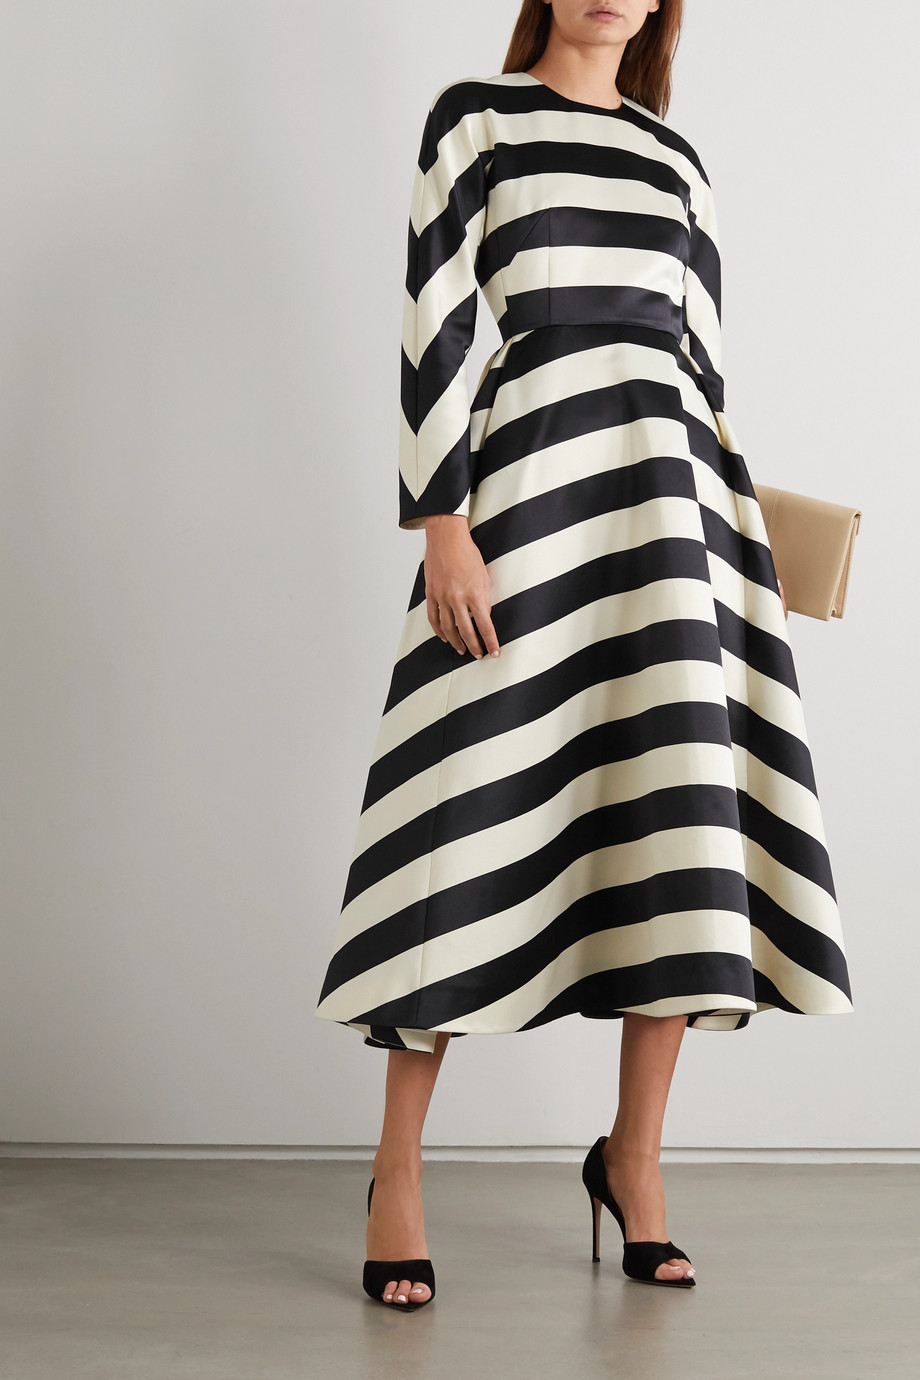 Emilia Wickstead Cruz striped satin dress